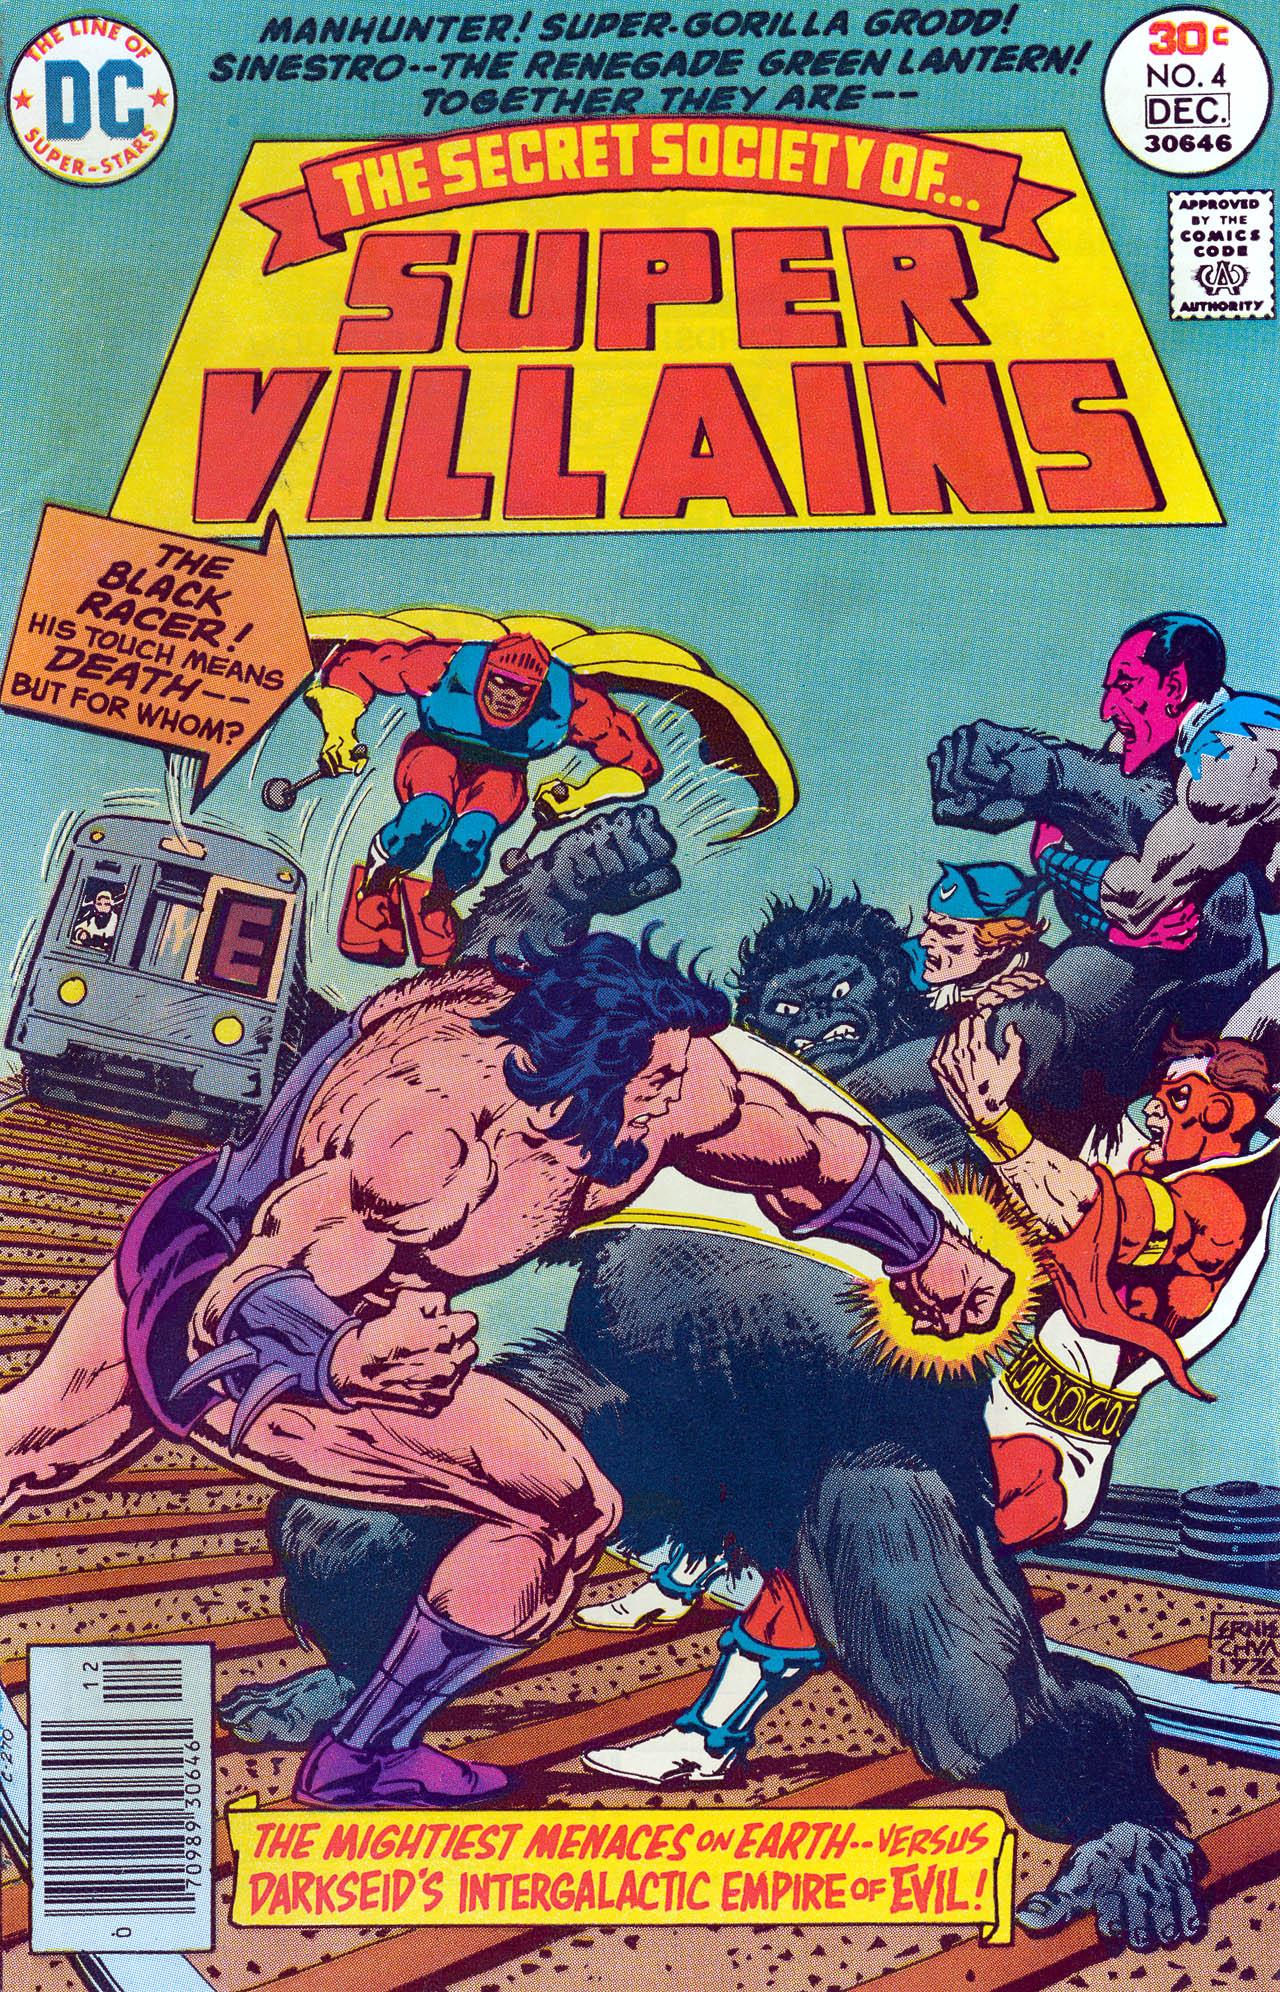 Read online Secret Society of Super-Villains comic -  Issue #4 - 1